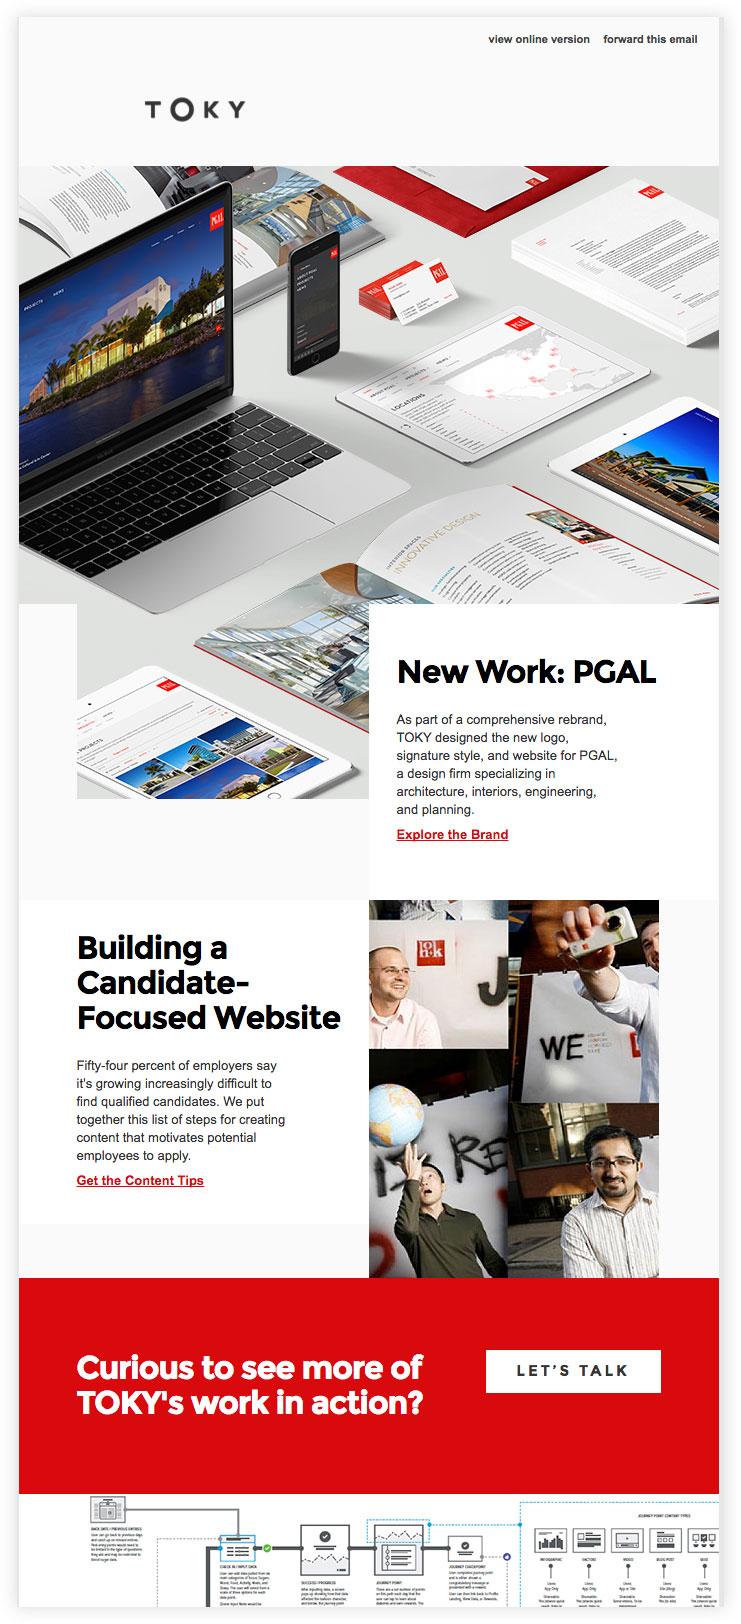 Screenshot of TOKY's Architecture Branding Newsletter